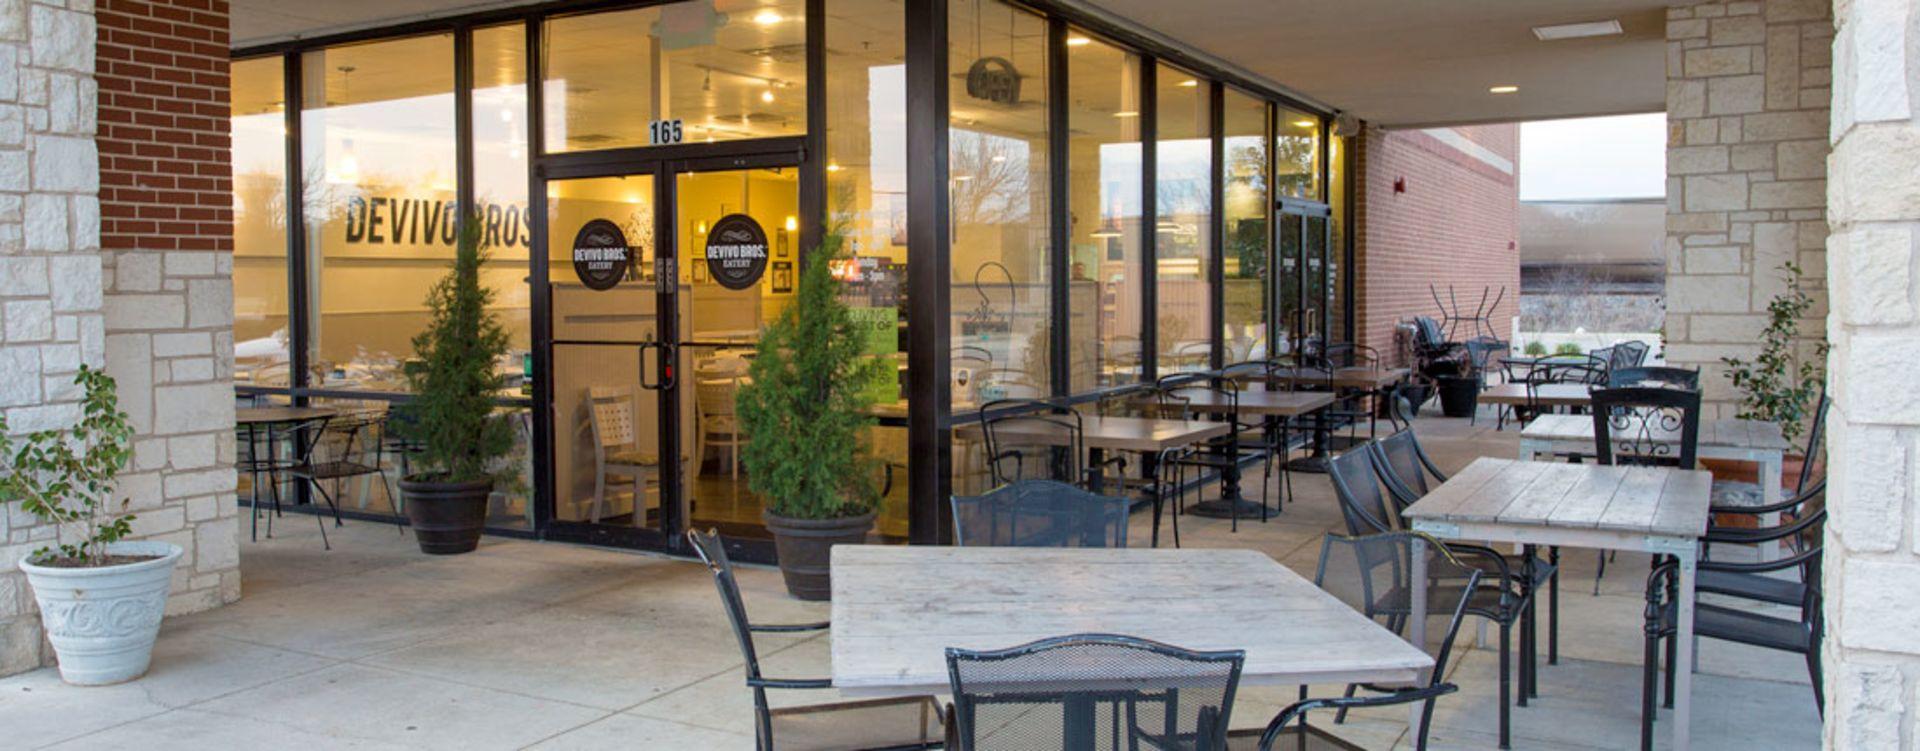 Keller Neighborhood Hotspot: DeVivo Brothers Eatery